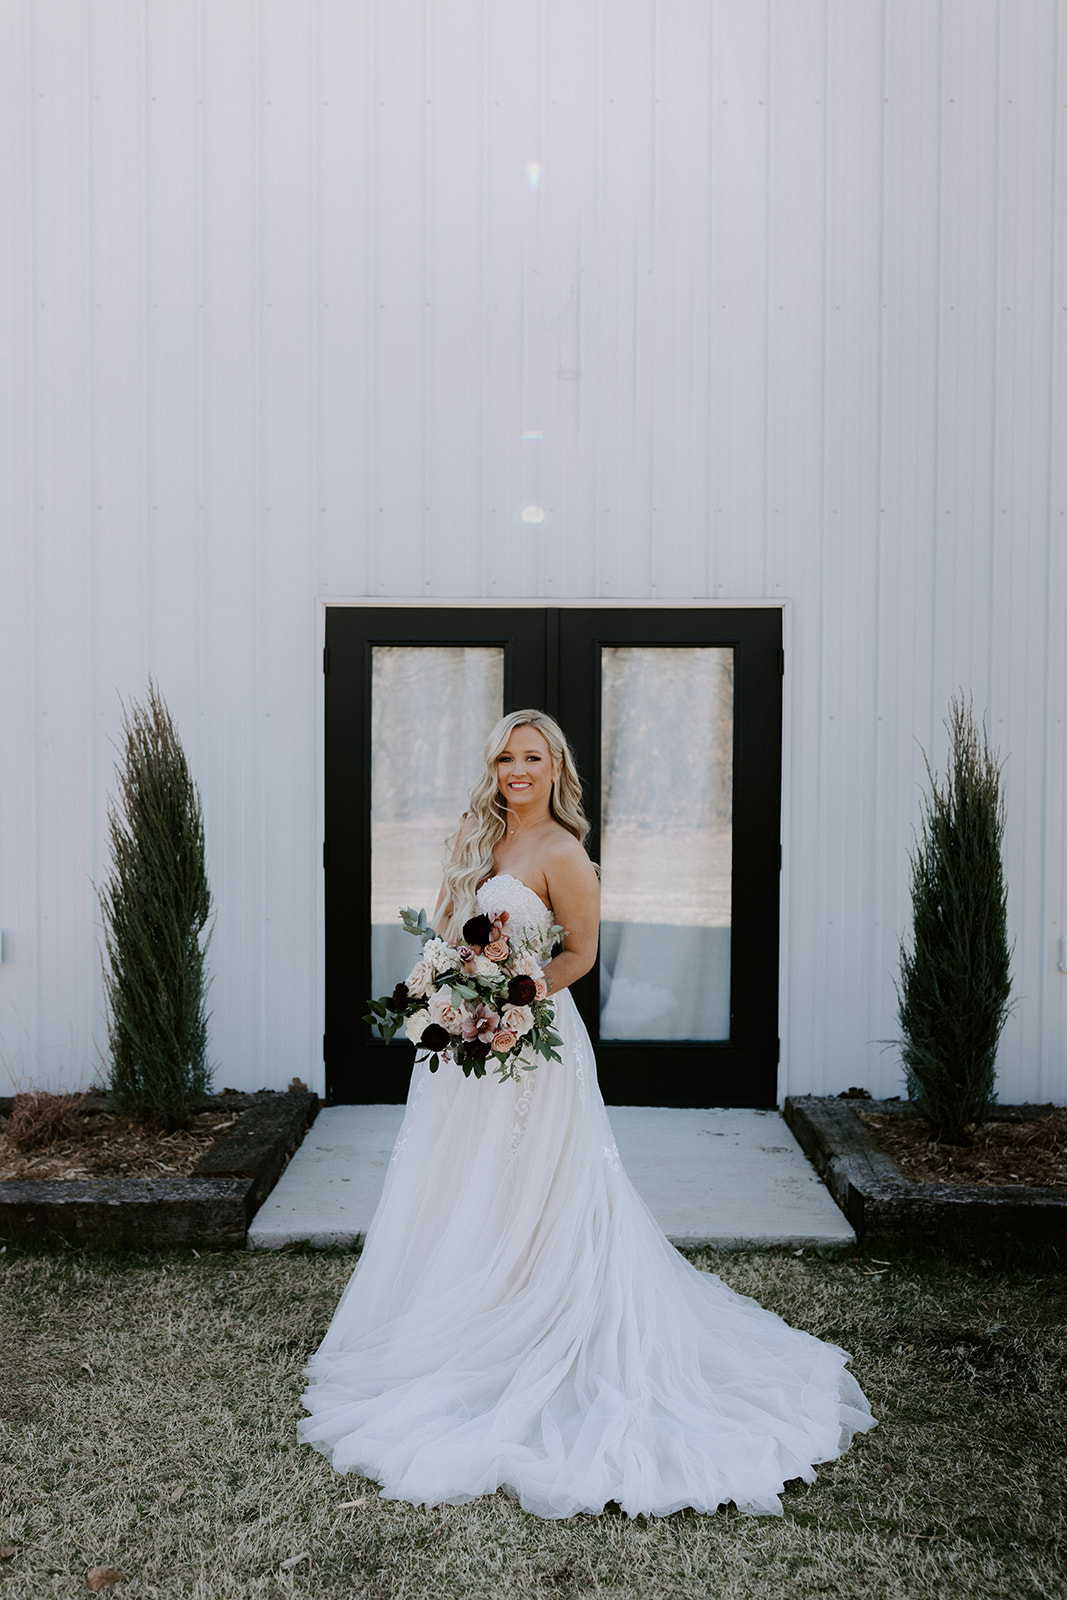 wedding venues tulsa bixby white barn 22.jpg